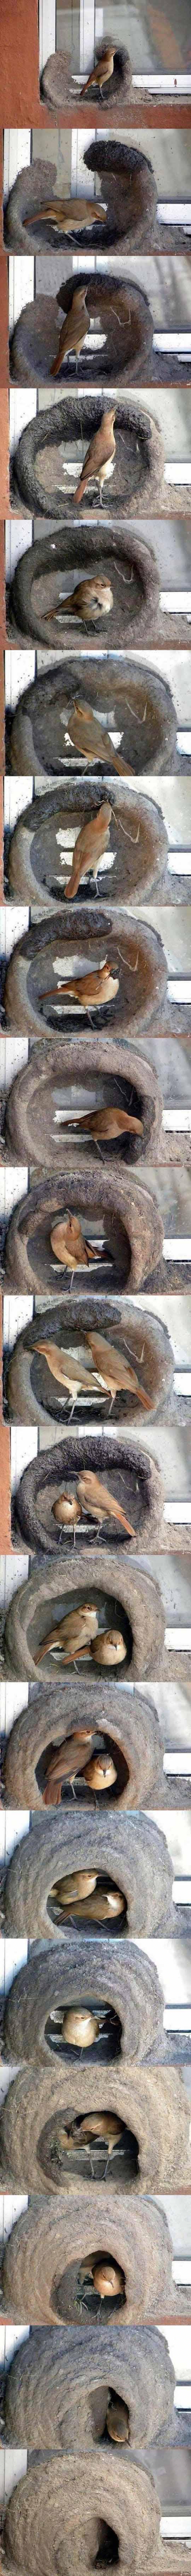 Birds Building A Nest.